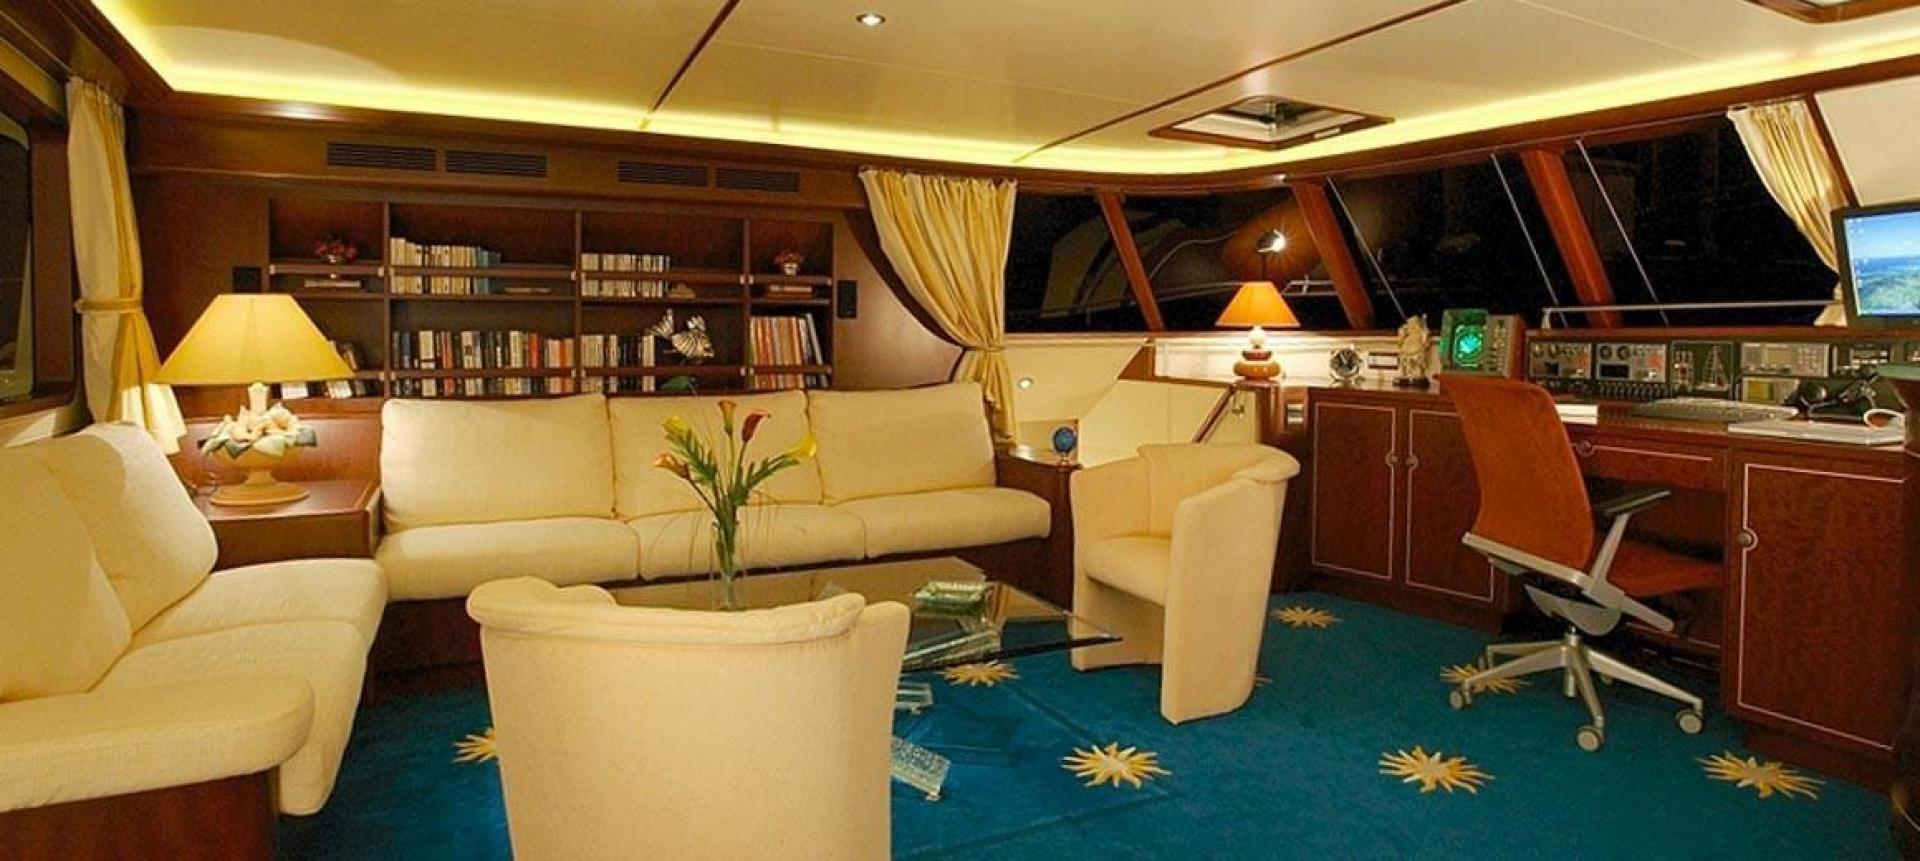 JFA-Catamaran 2004-Azizam Miami-Florida-United States-1367456 | Thumbnail